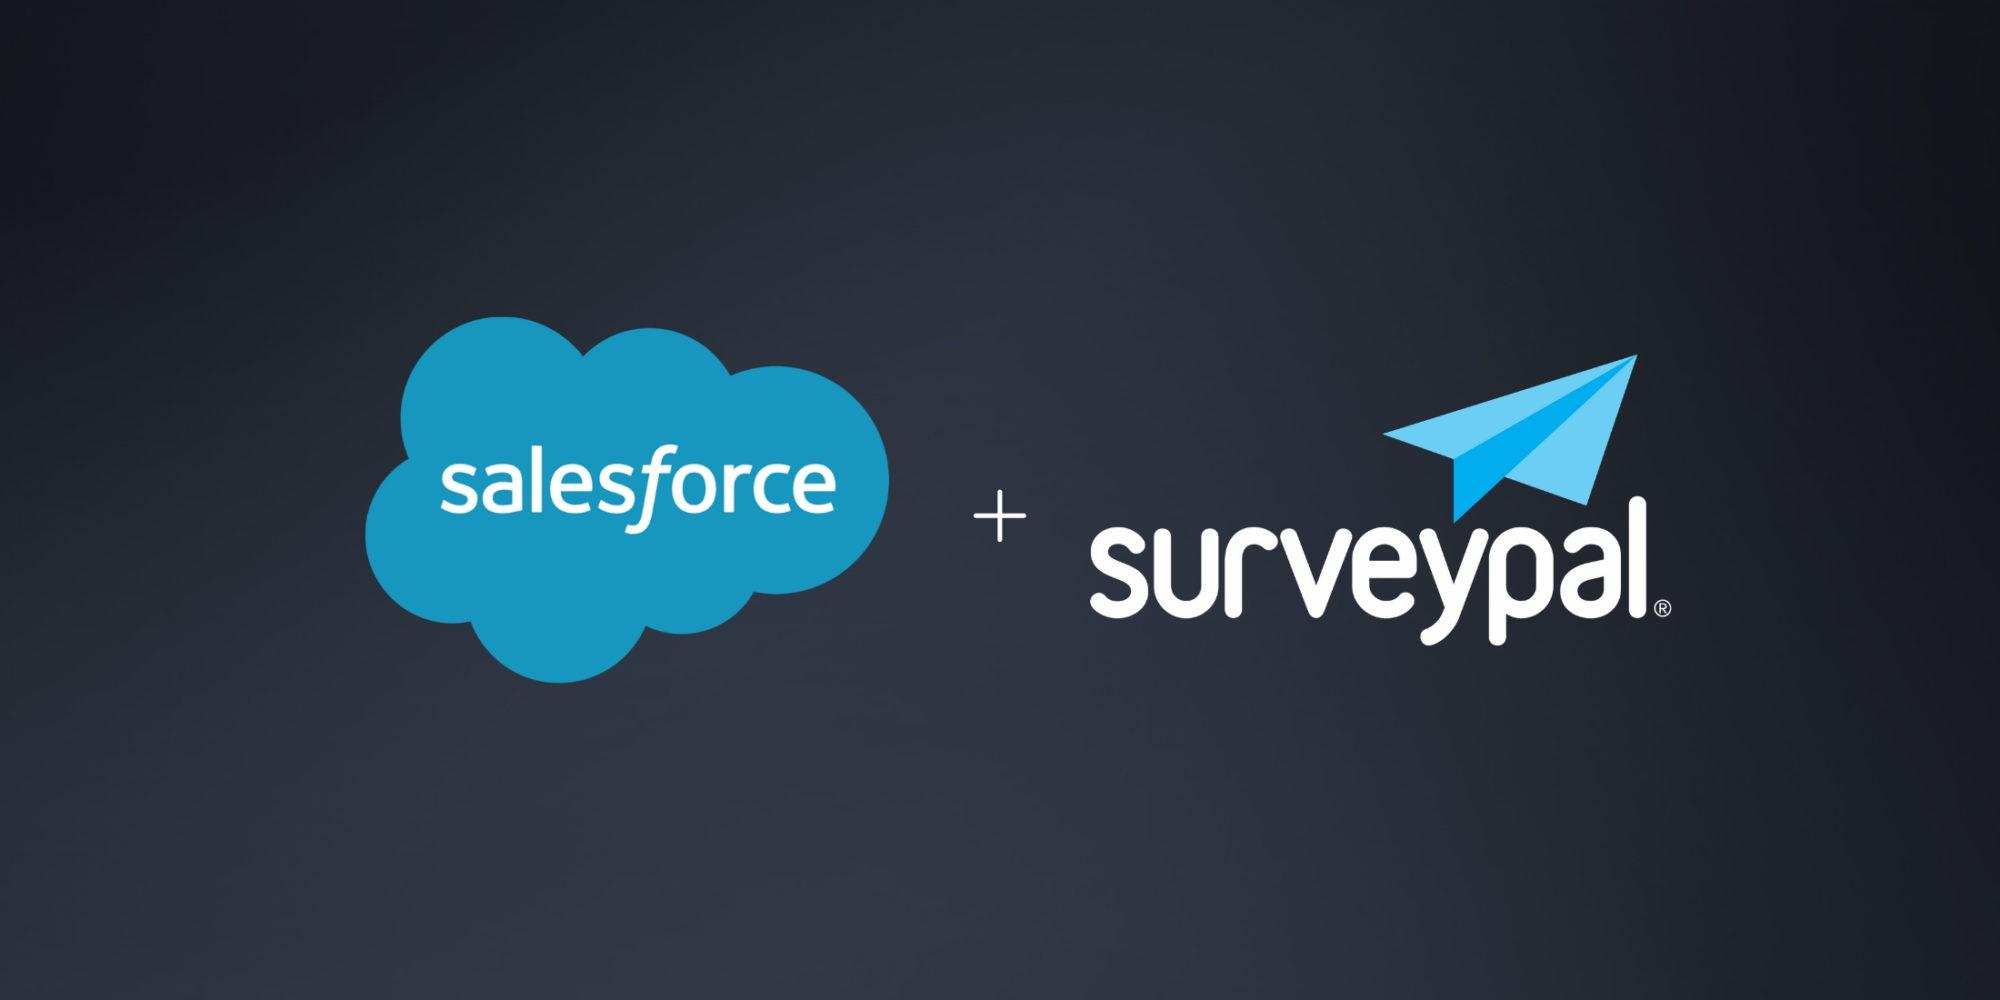 Salesforce logo next to Surveypal logo on a dark background